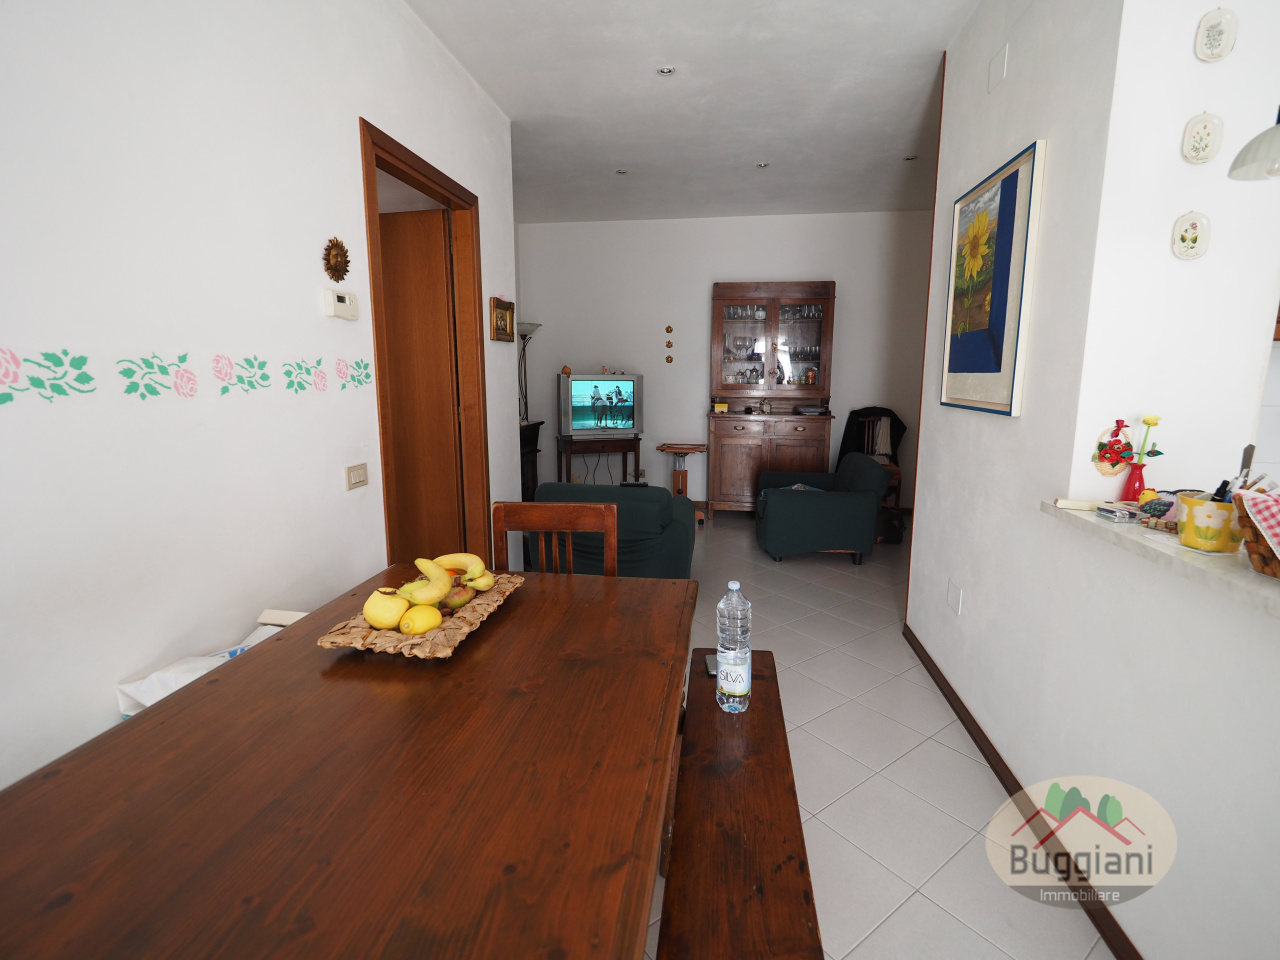 Appartamento in vendita RIF. 1715, Montopoli in Val d'Arno (PI)